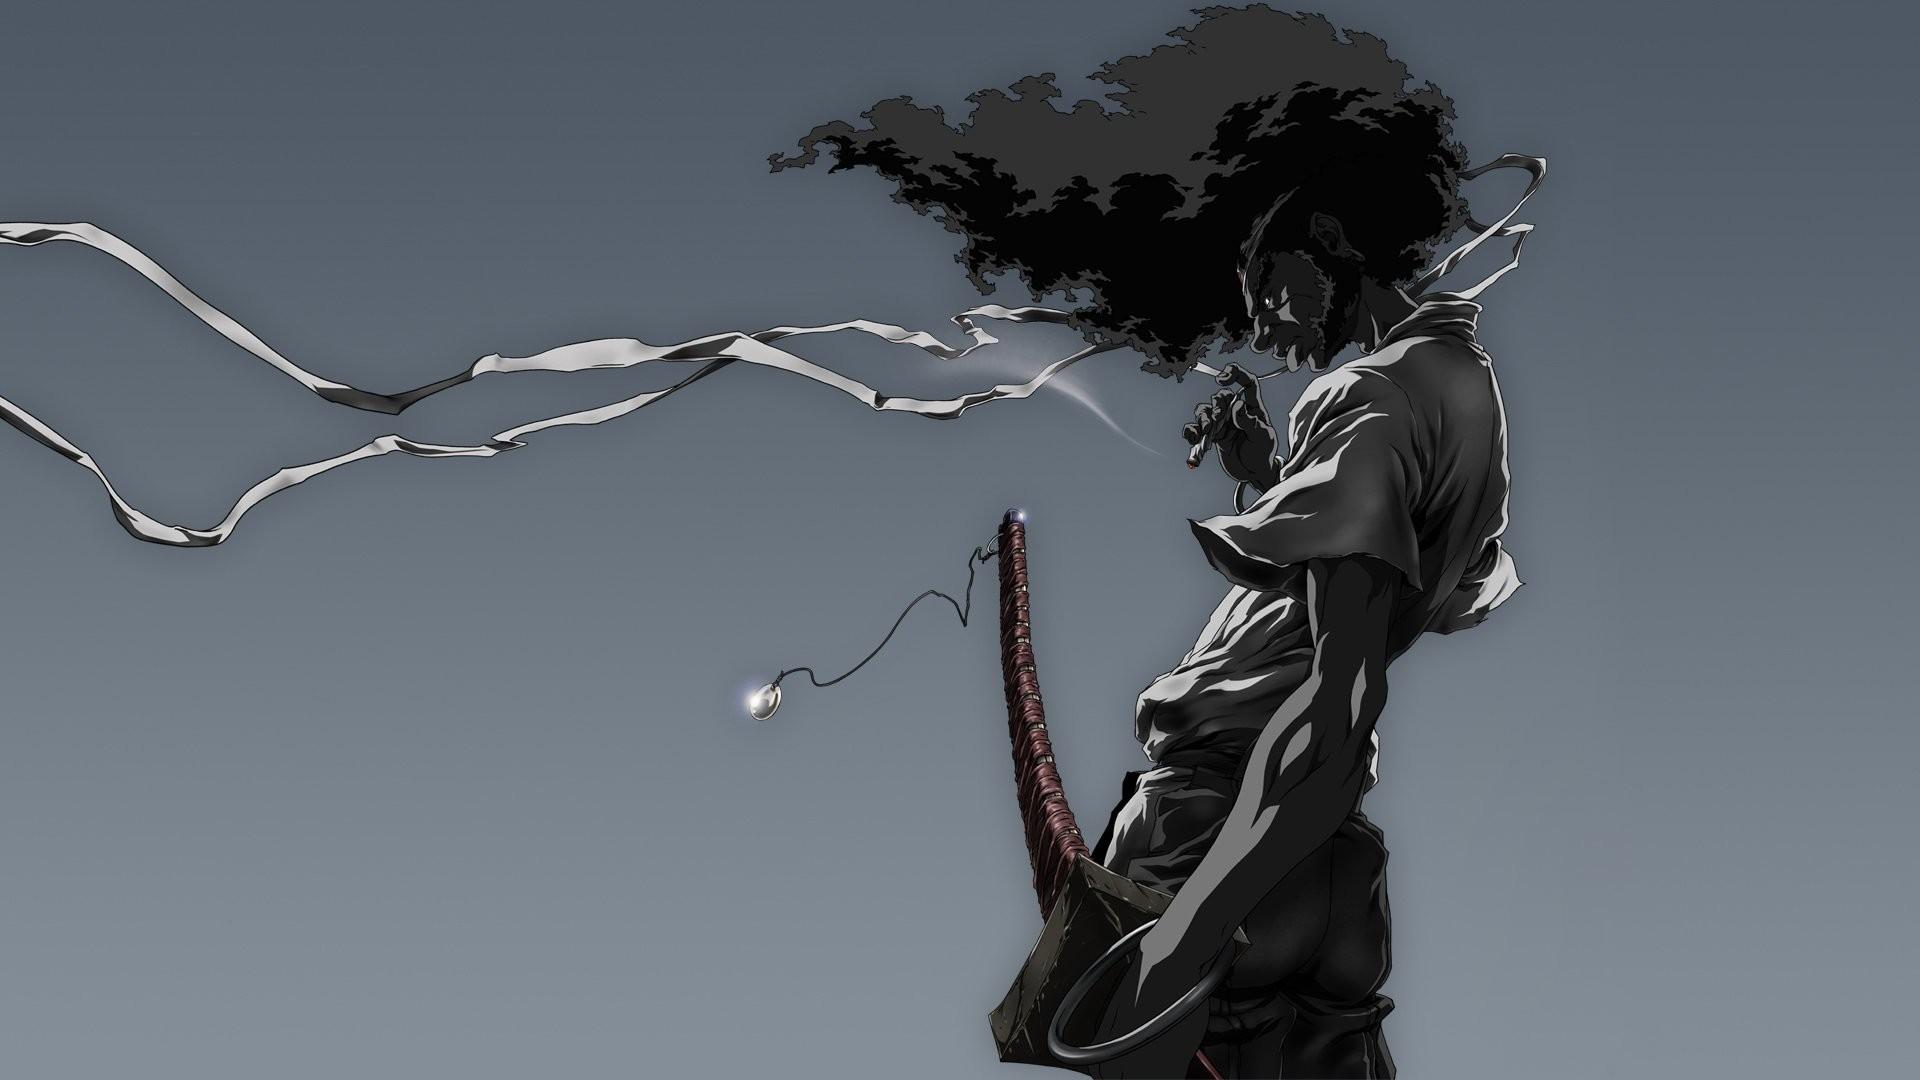 HD Wallpaper   Background ID:203247. Anime Afro Samurai